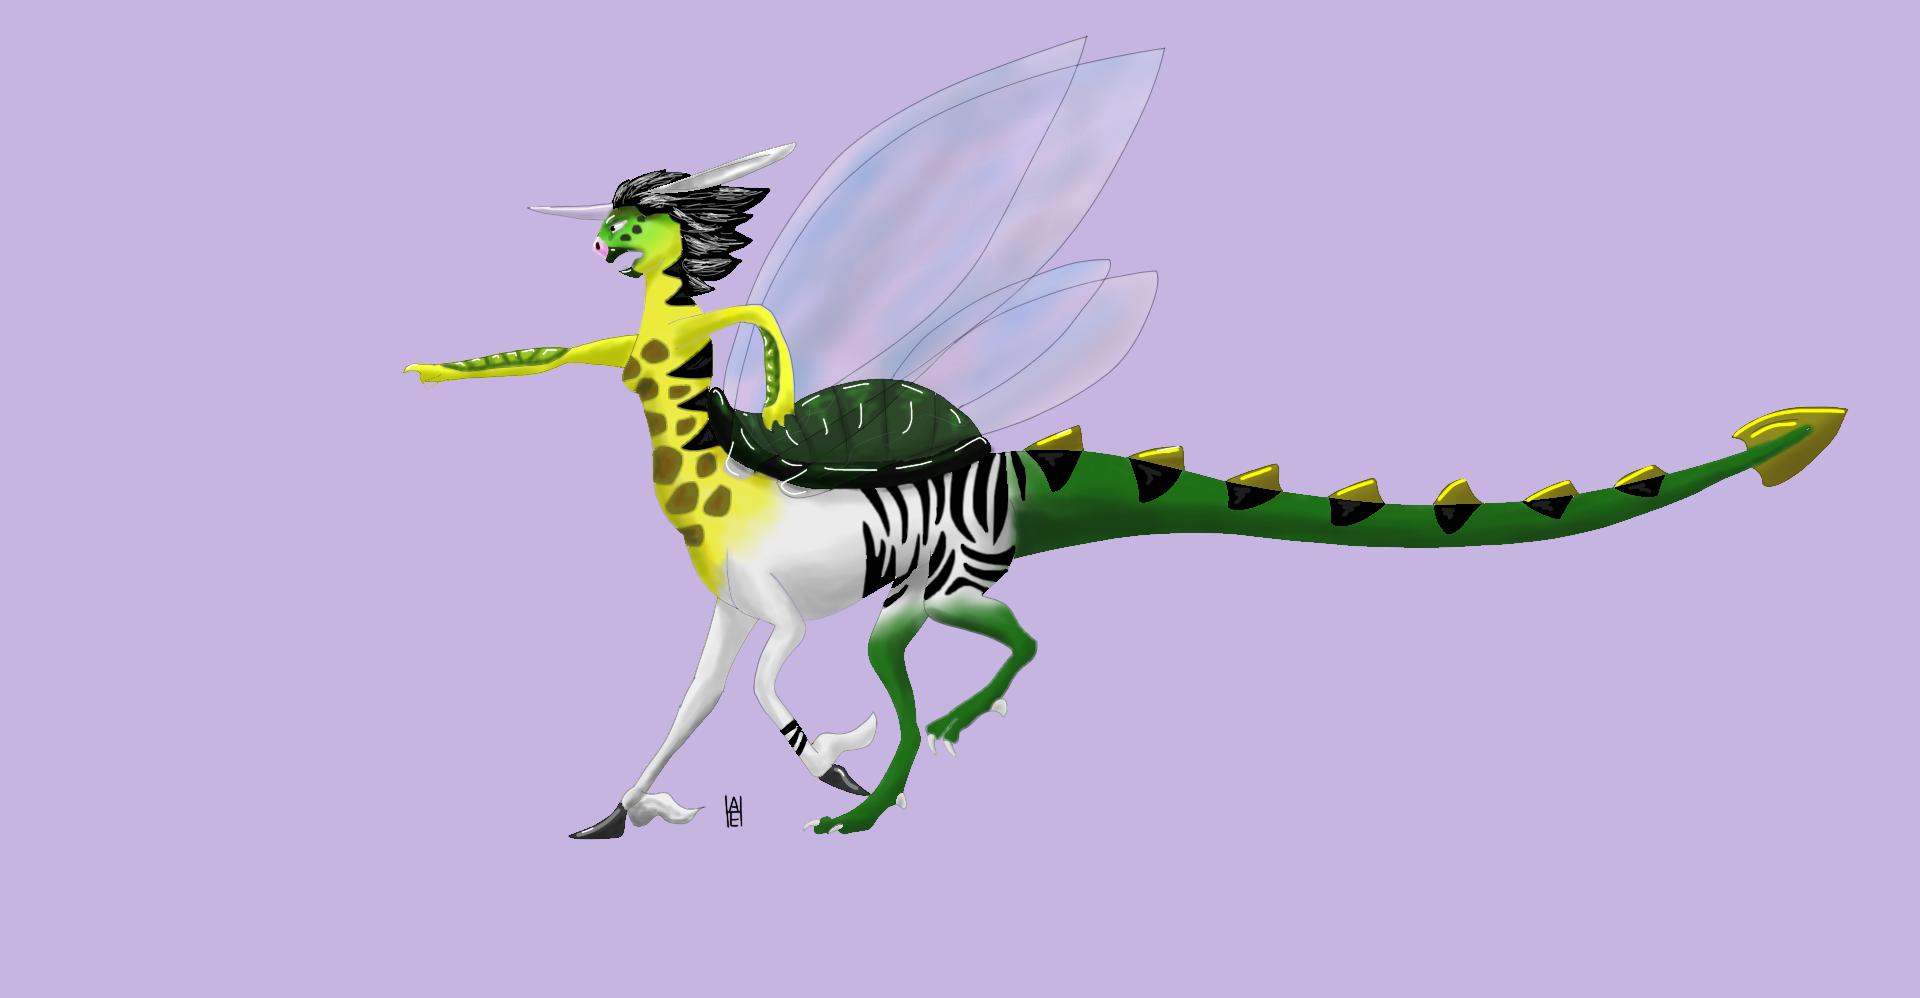 image unicorn turtle dragon fairy centaur body1 png wings of